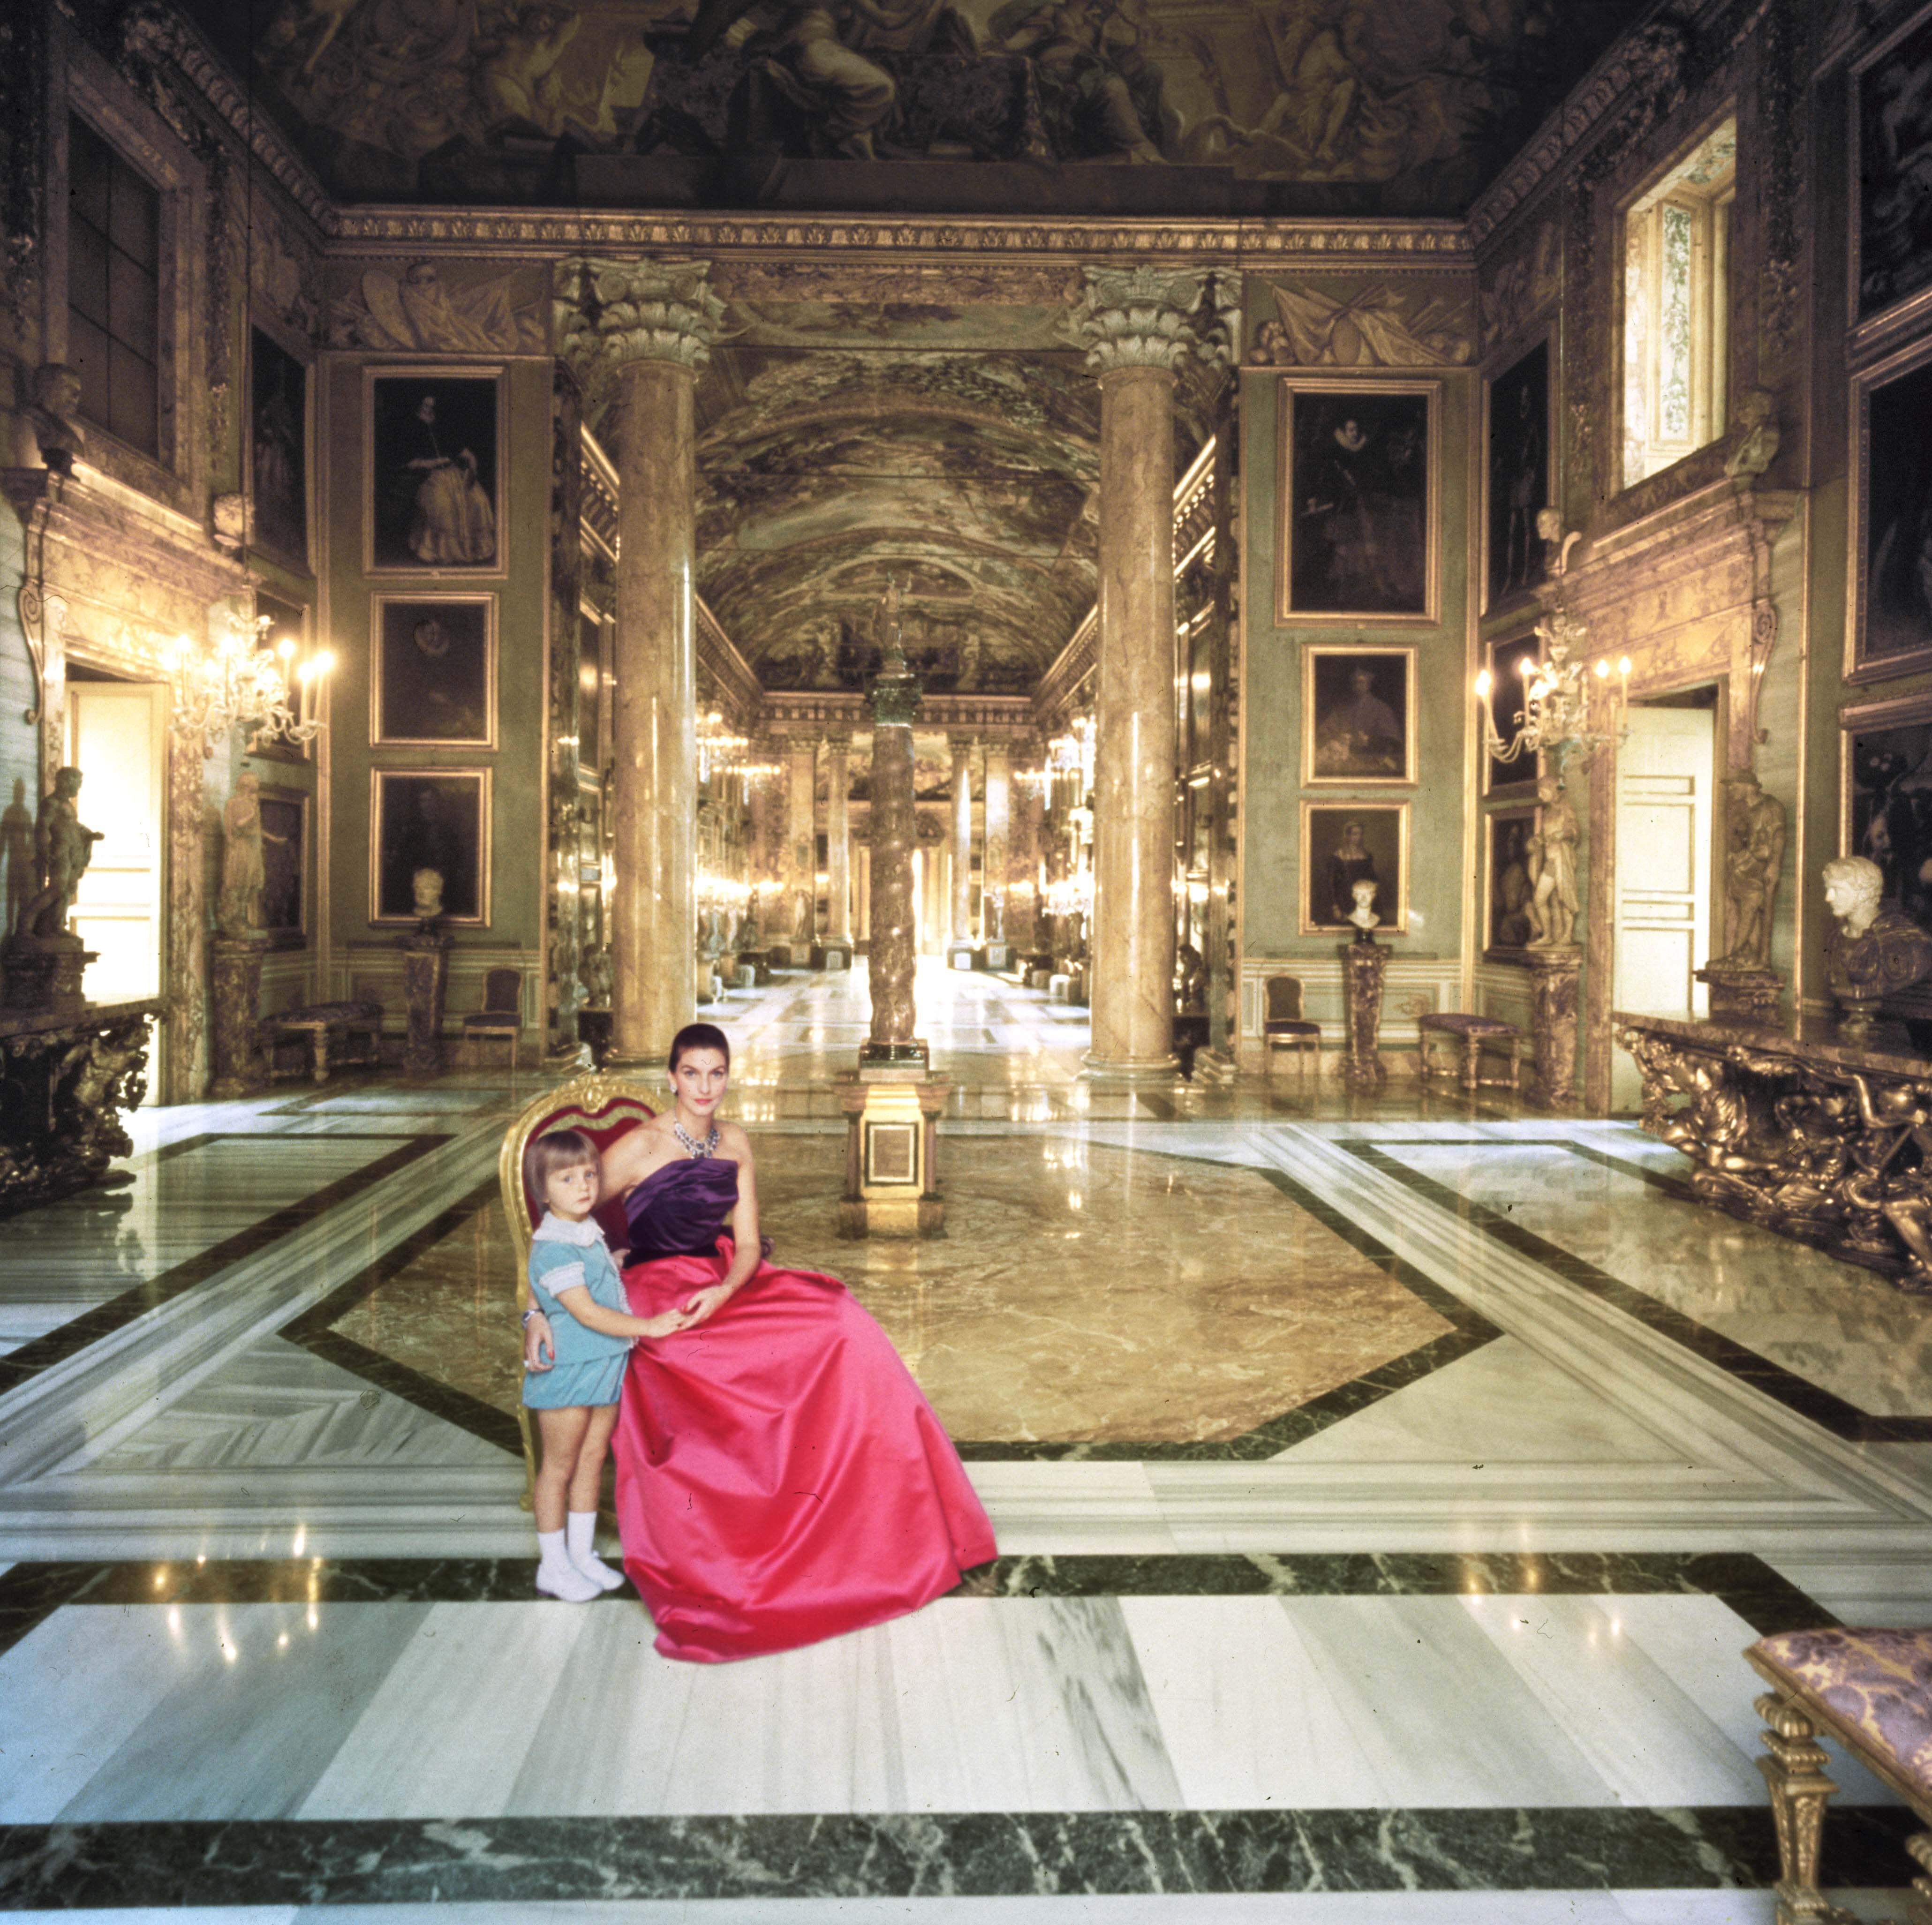 Inside Palazzo Colonna, Rome's Last Great Sanctuary of Renaissance Splendor